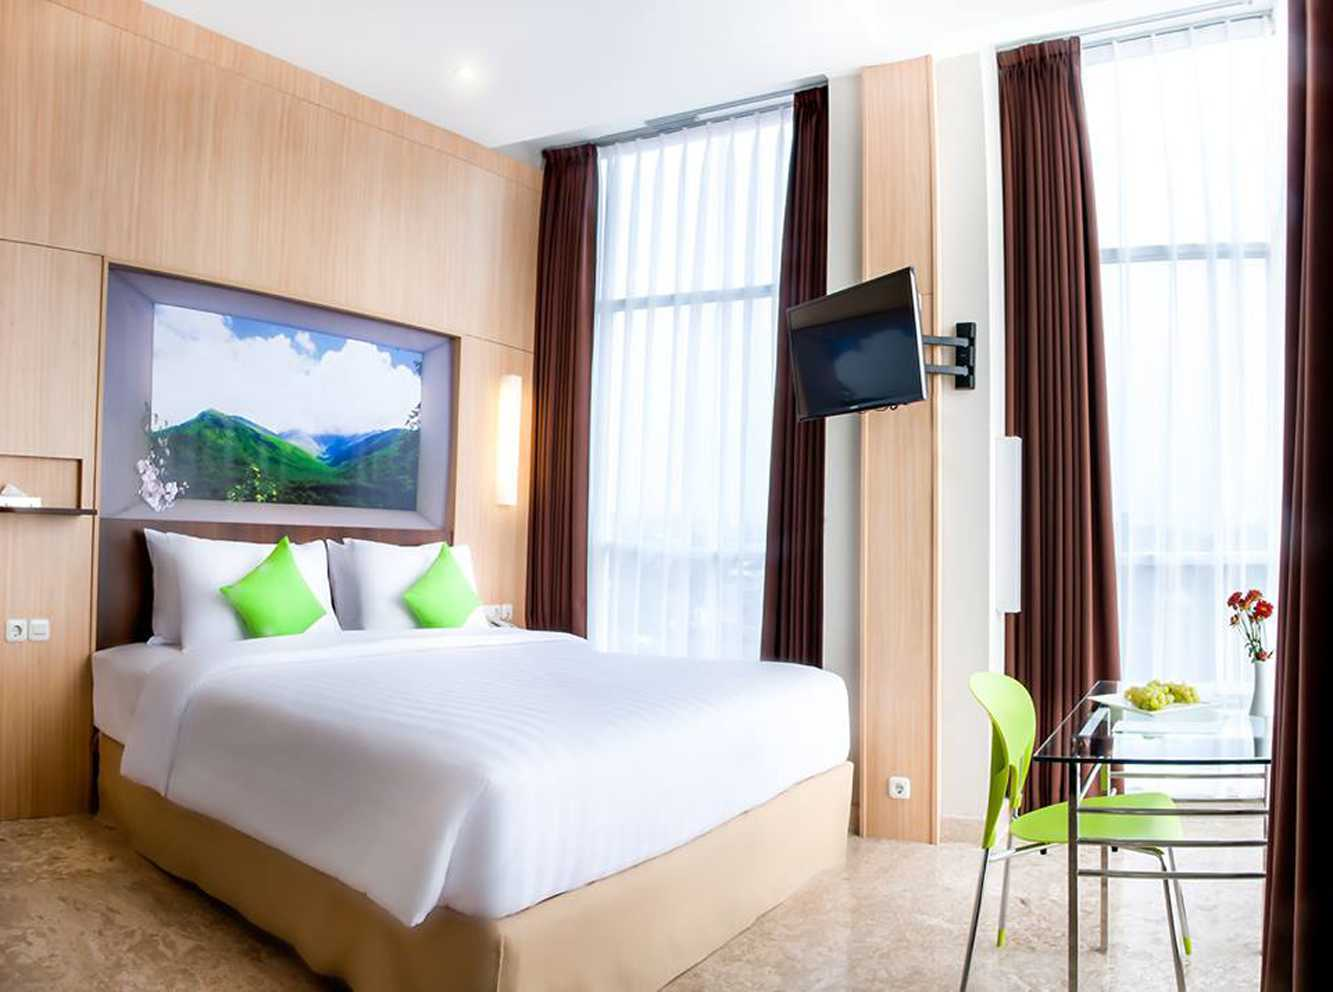 Tebu Hotel Karya Wandi Uwa Krisdian (Sumber: arsitag.com)